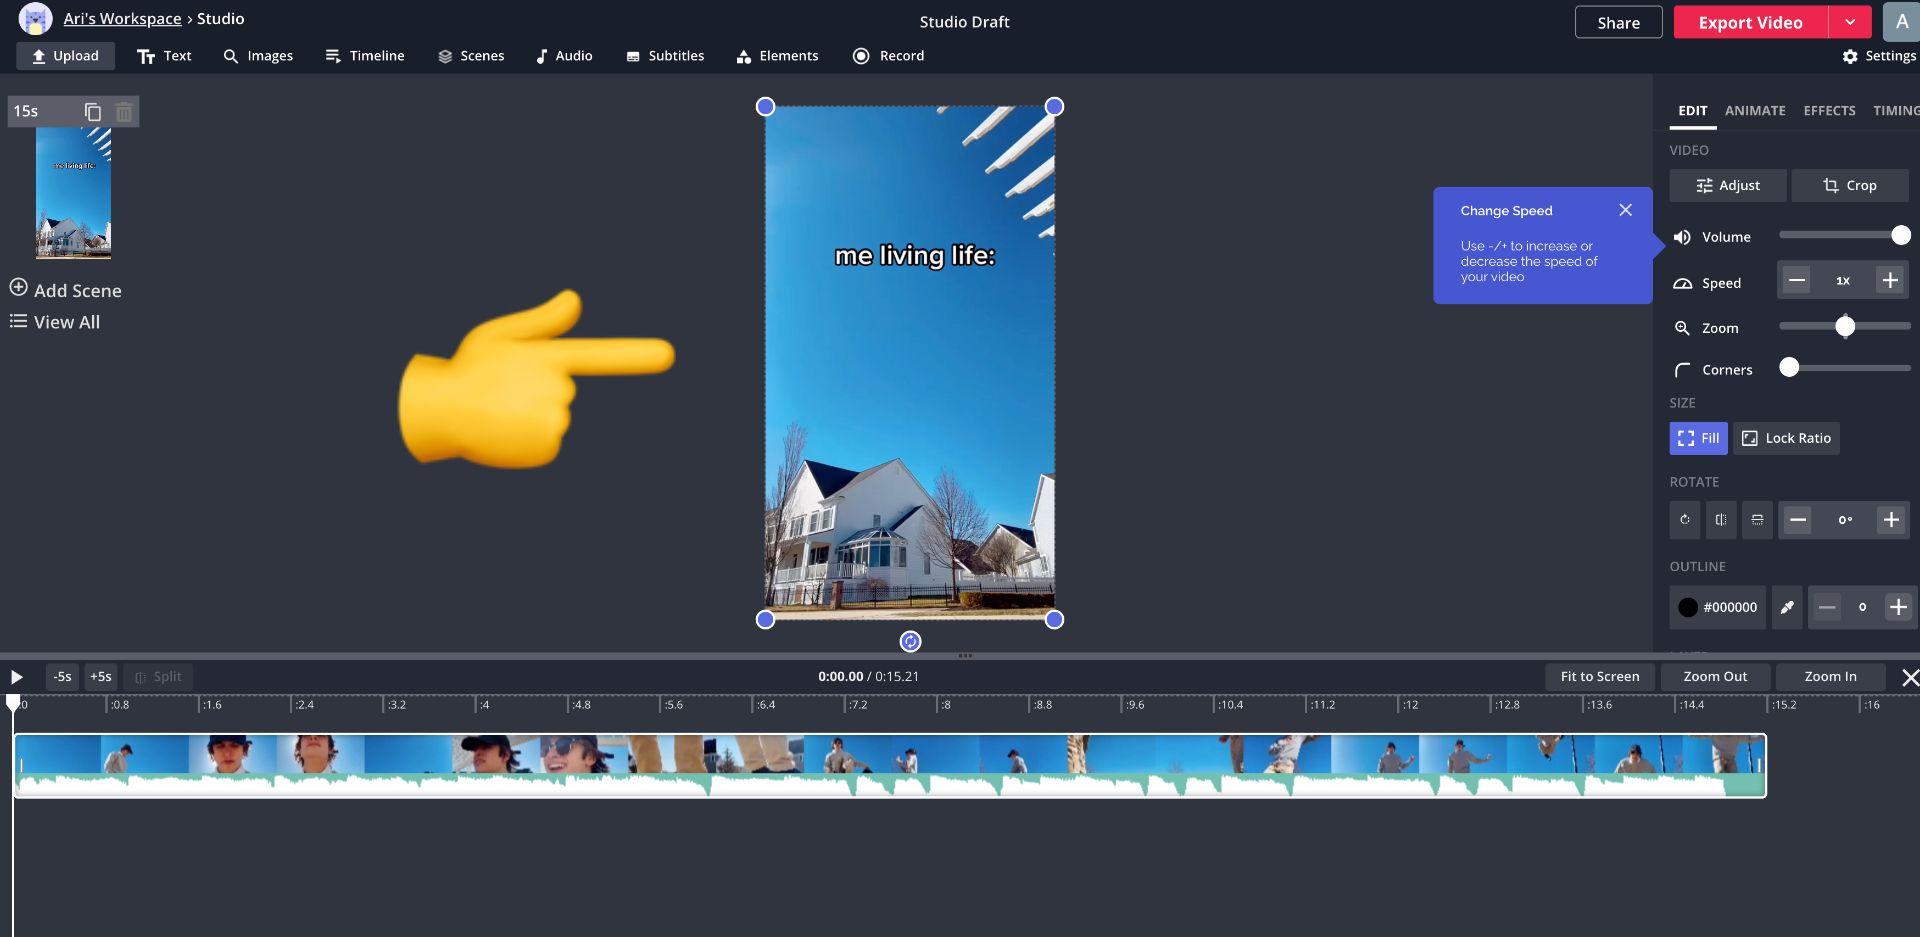 screenshot of Kapwing studio and an emoji pointing to a TikTok video